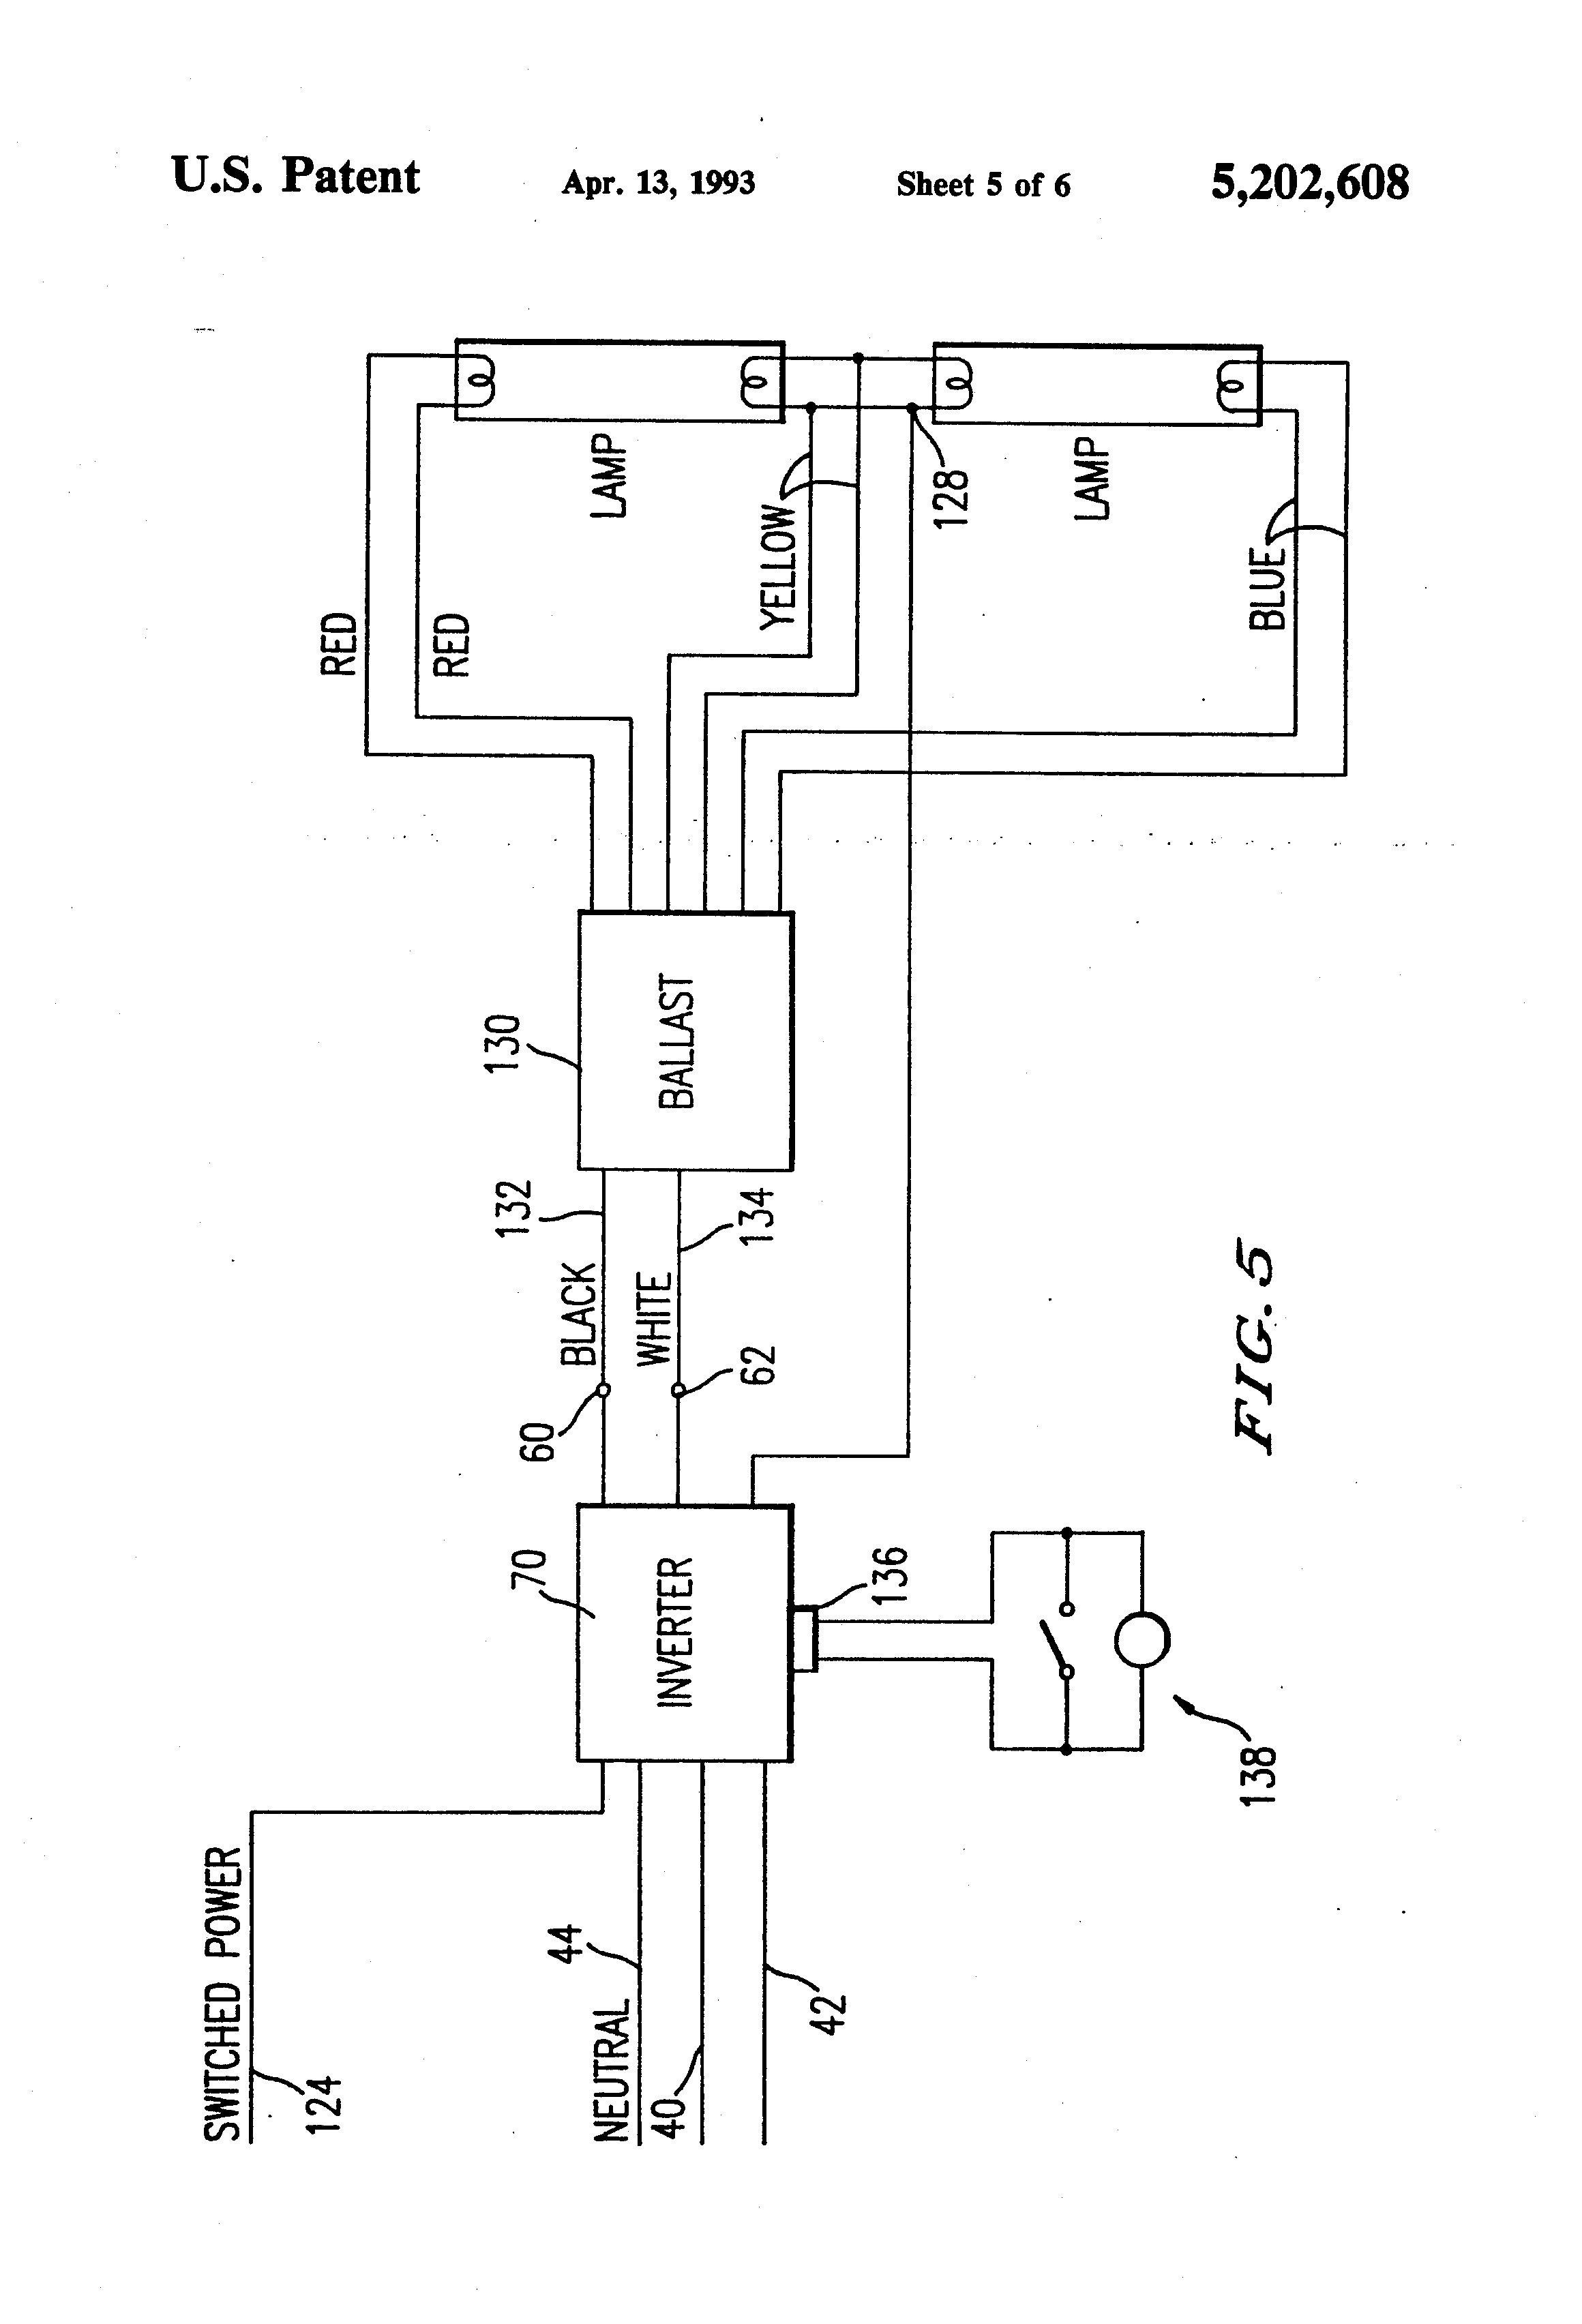 3 L T8 Ballast Wiring Diagram Free Download - Simple Wiring Diagrams - Ballast Wiring Diagram T8